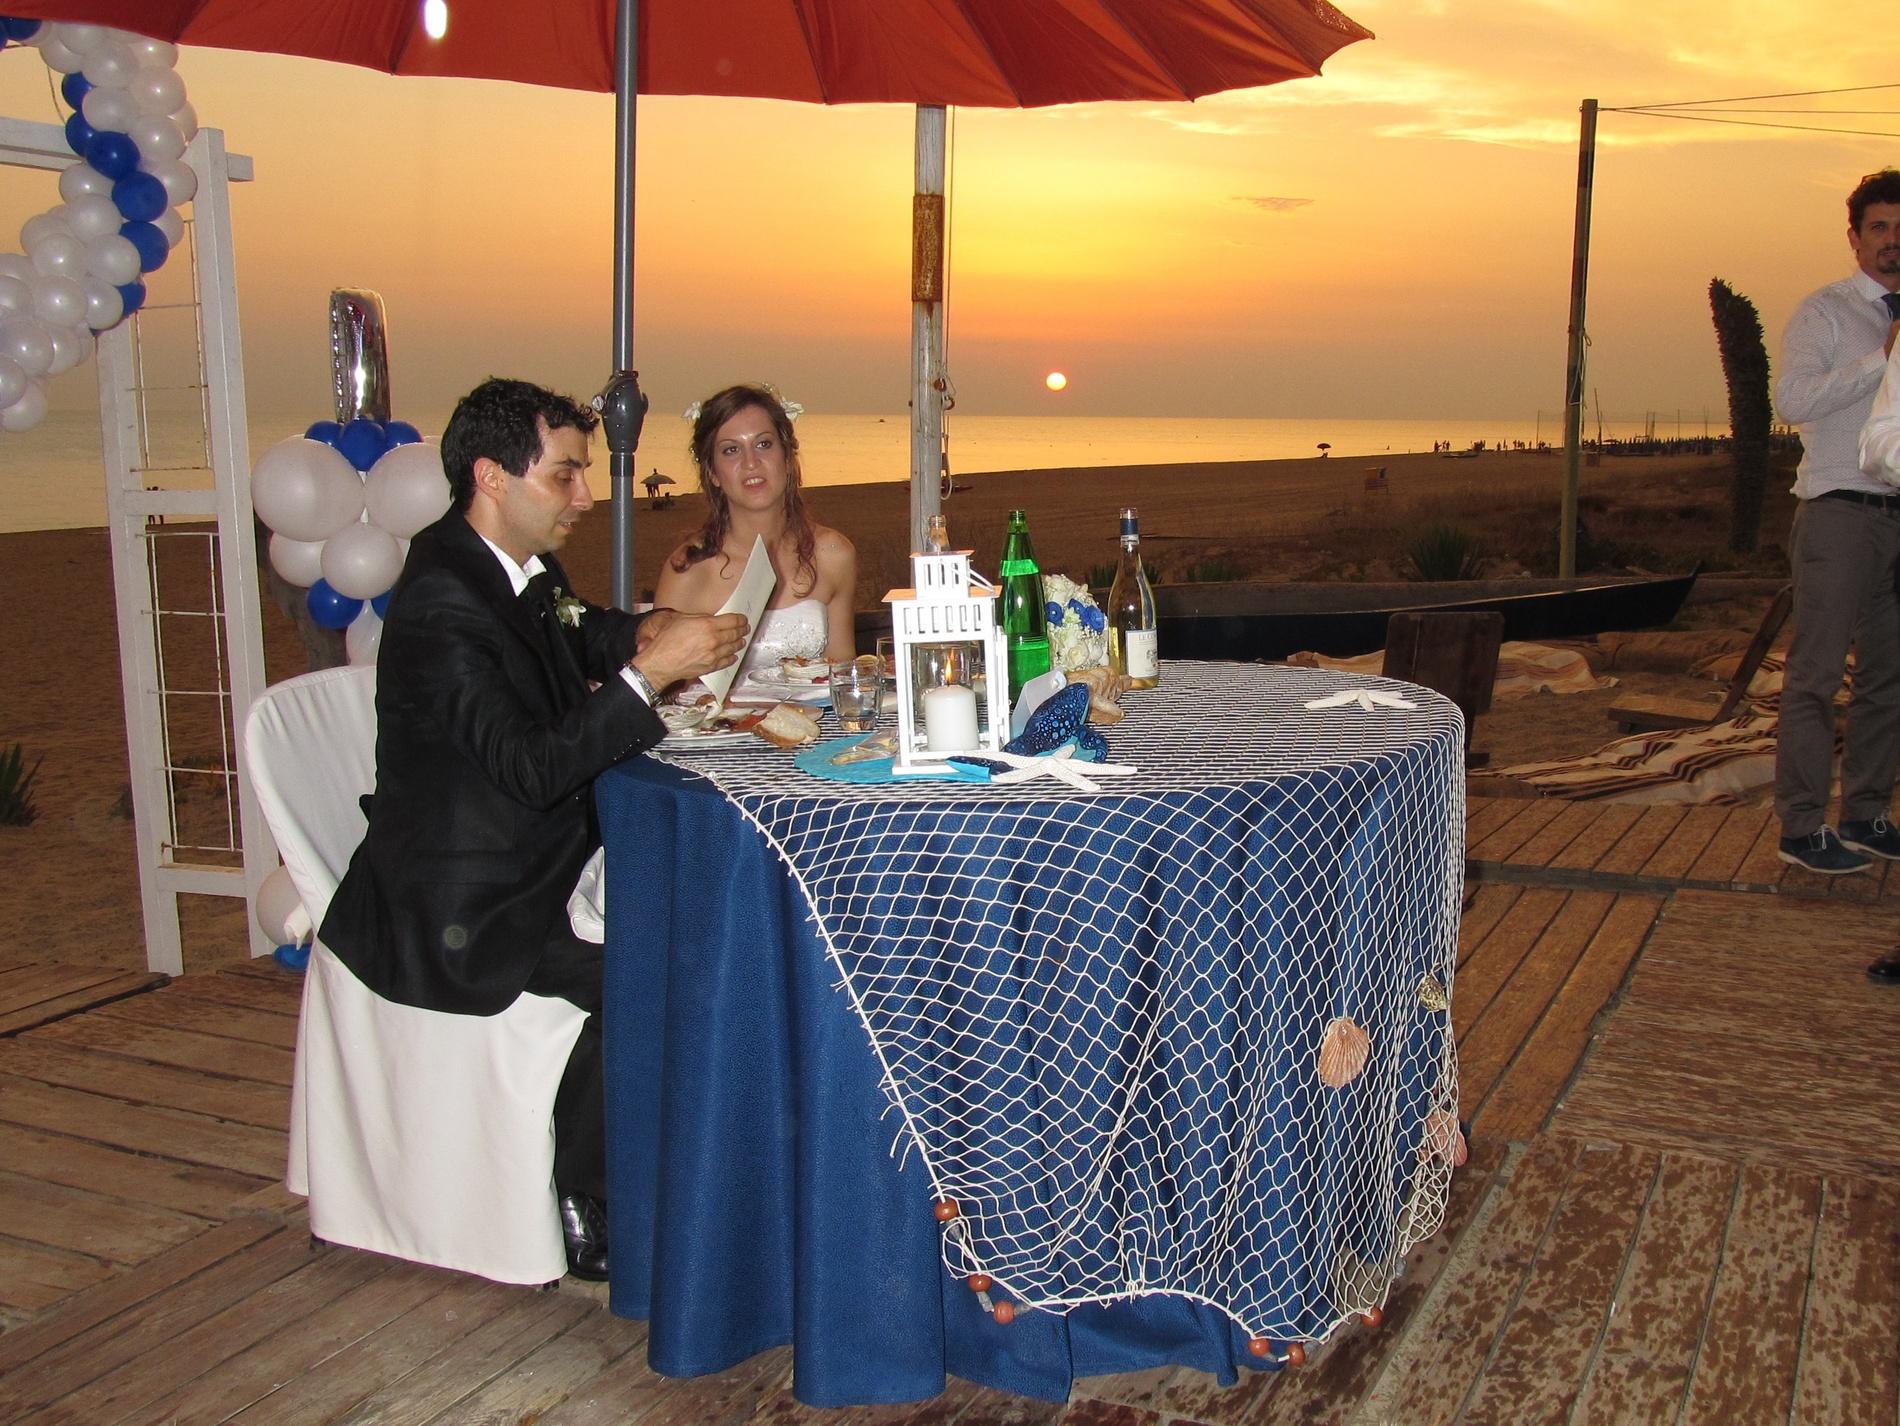 matrimonio-ilaria-torrisi-e-marco-di-lucia-2015-08-08-20-11-34